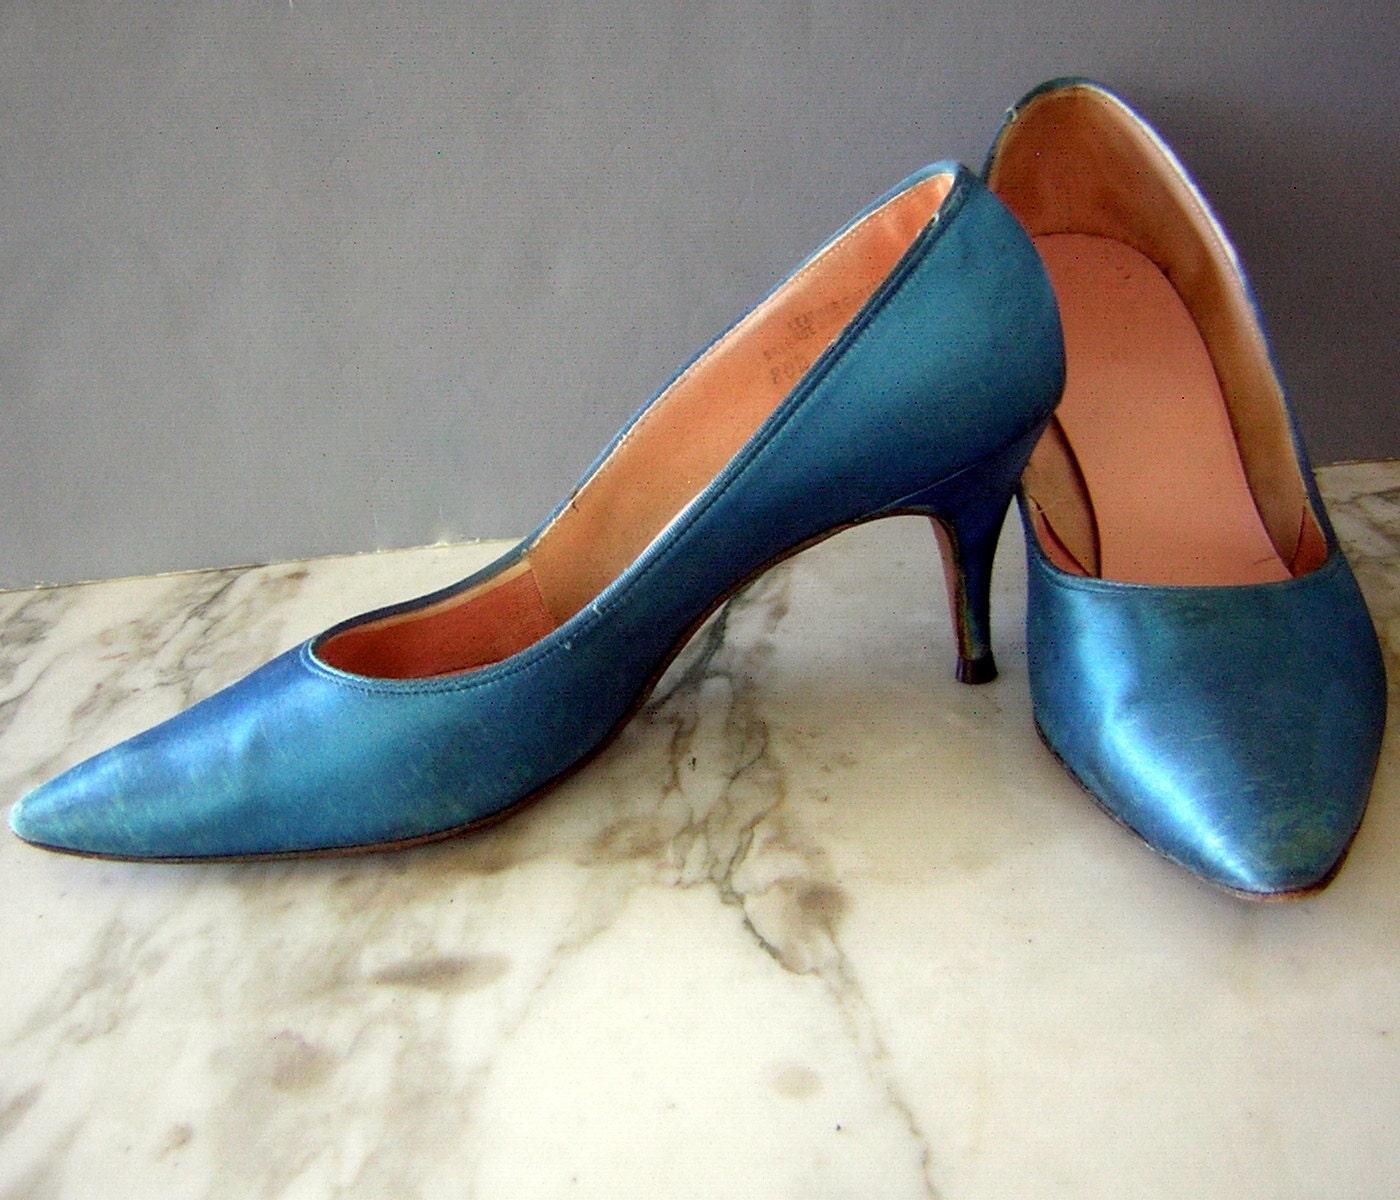 turquoise blue satin high heels pumps shoes vintage 60s us